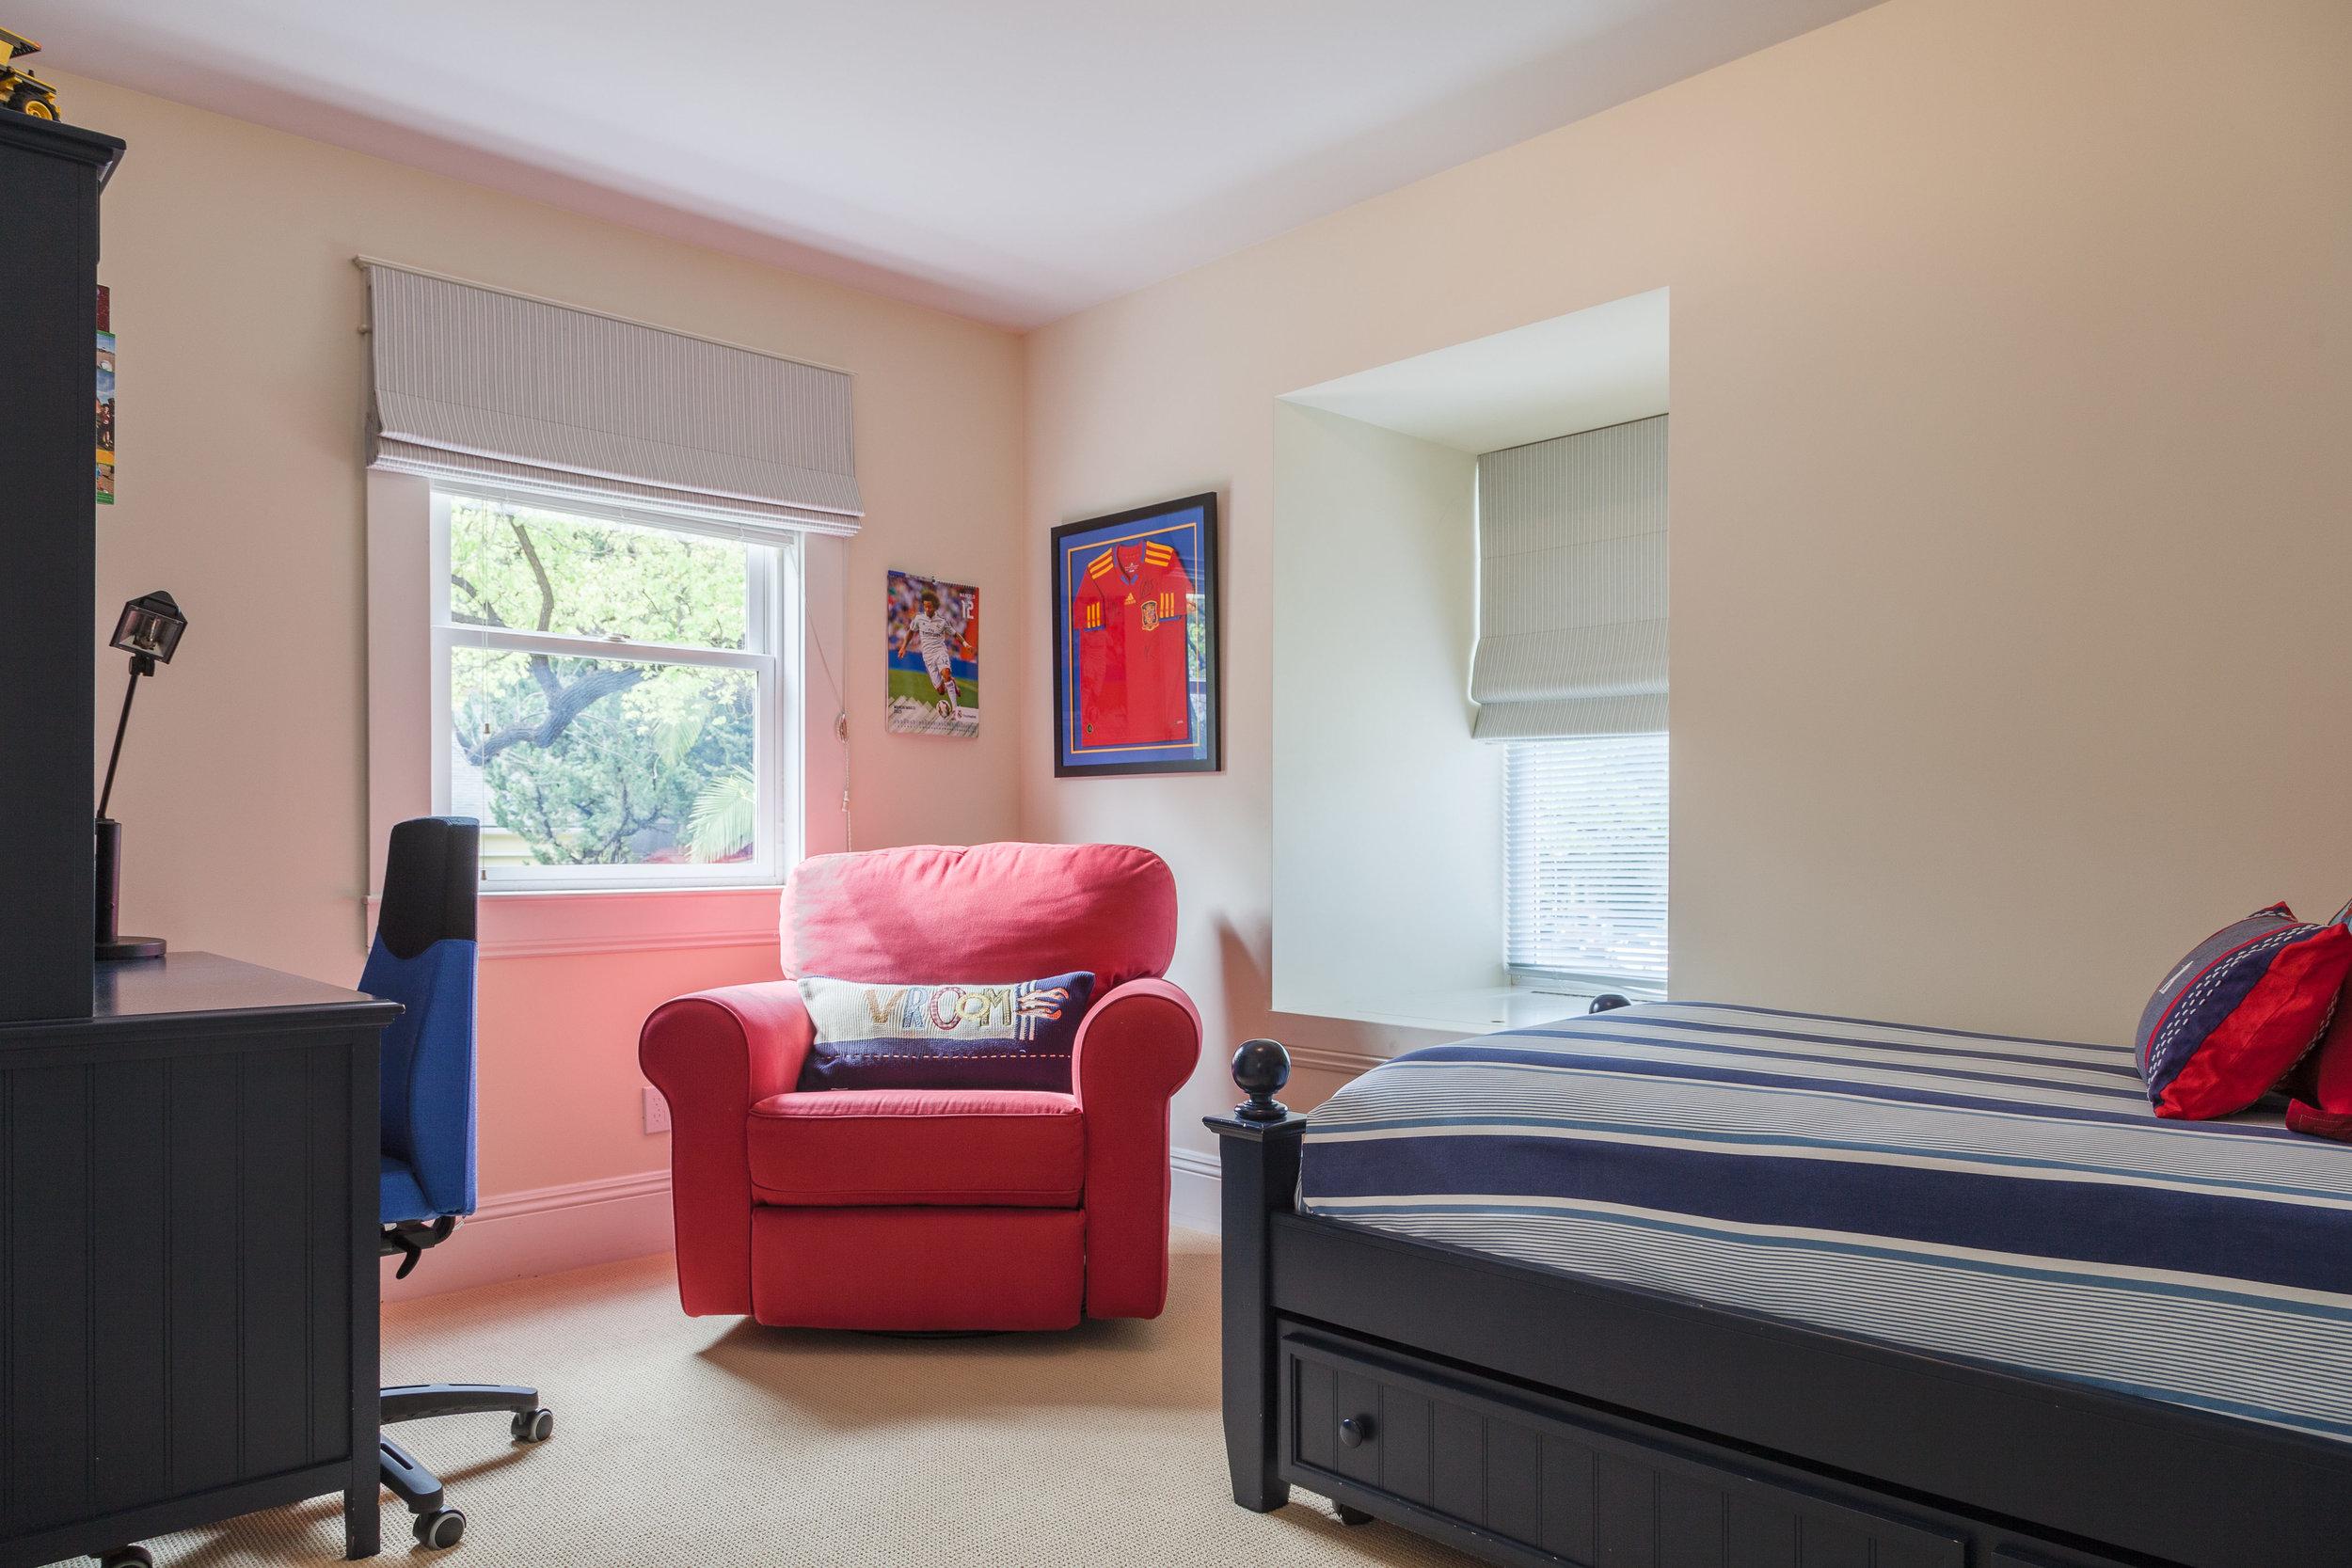 3163 La Suvida Dr Los Angeles-print-029-Bedroom-4200x2800-300dpi.jpg